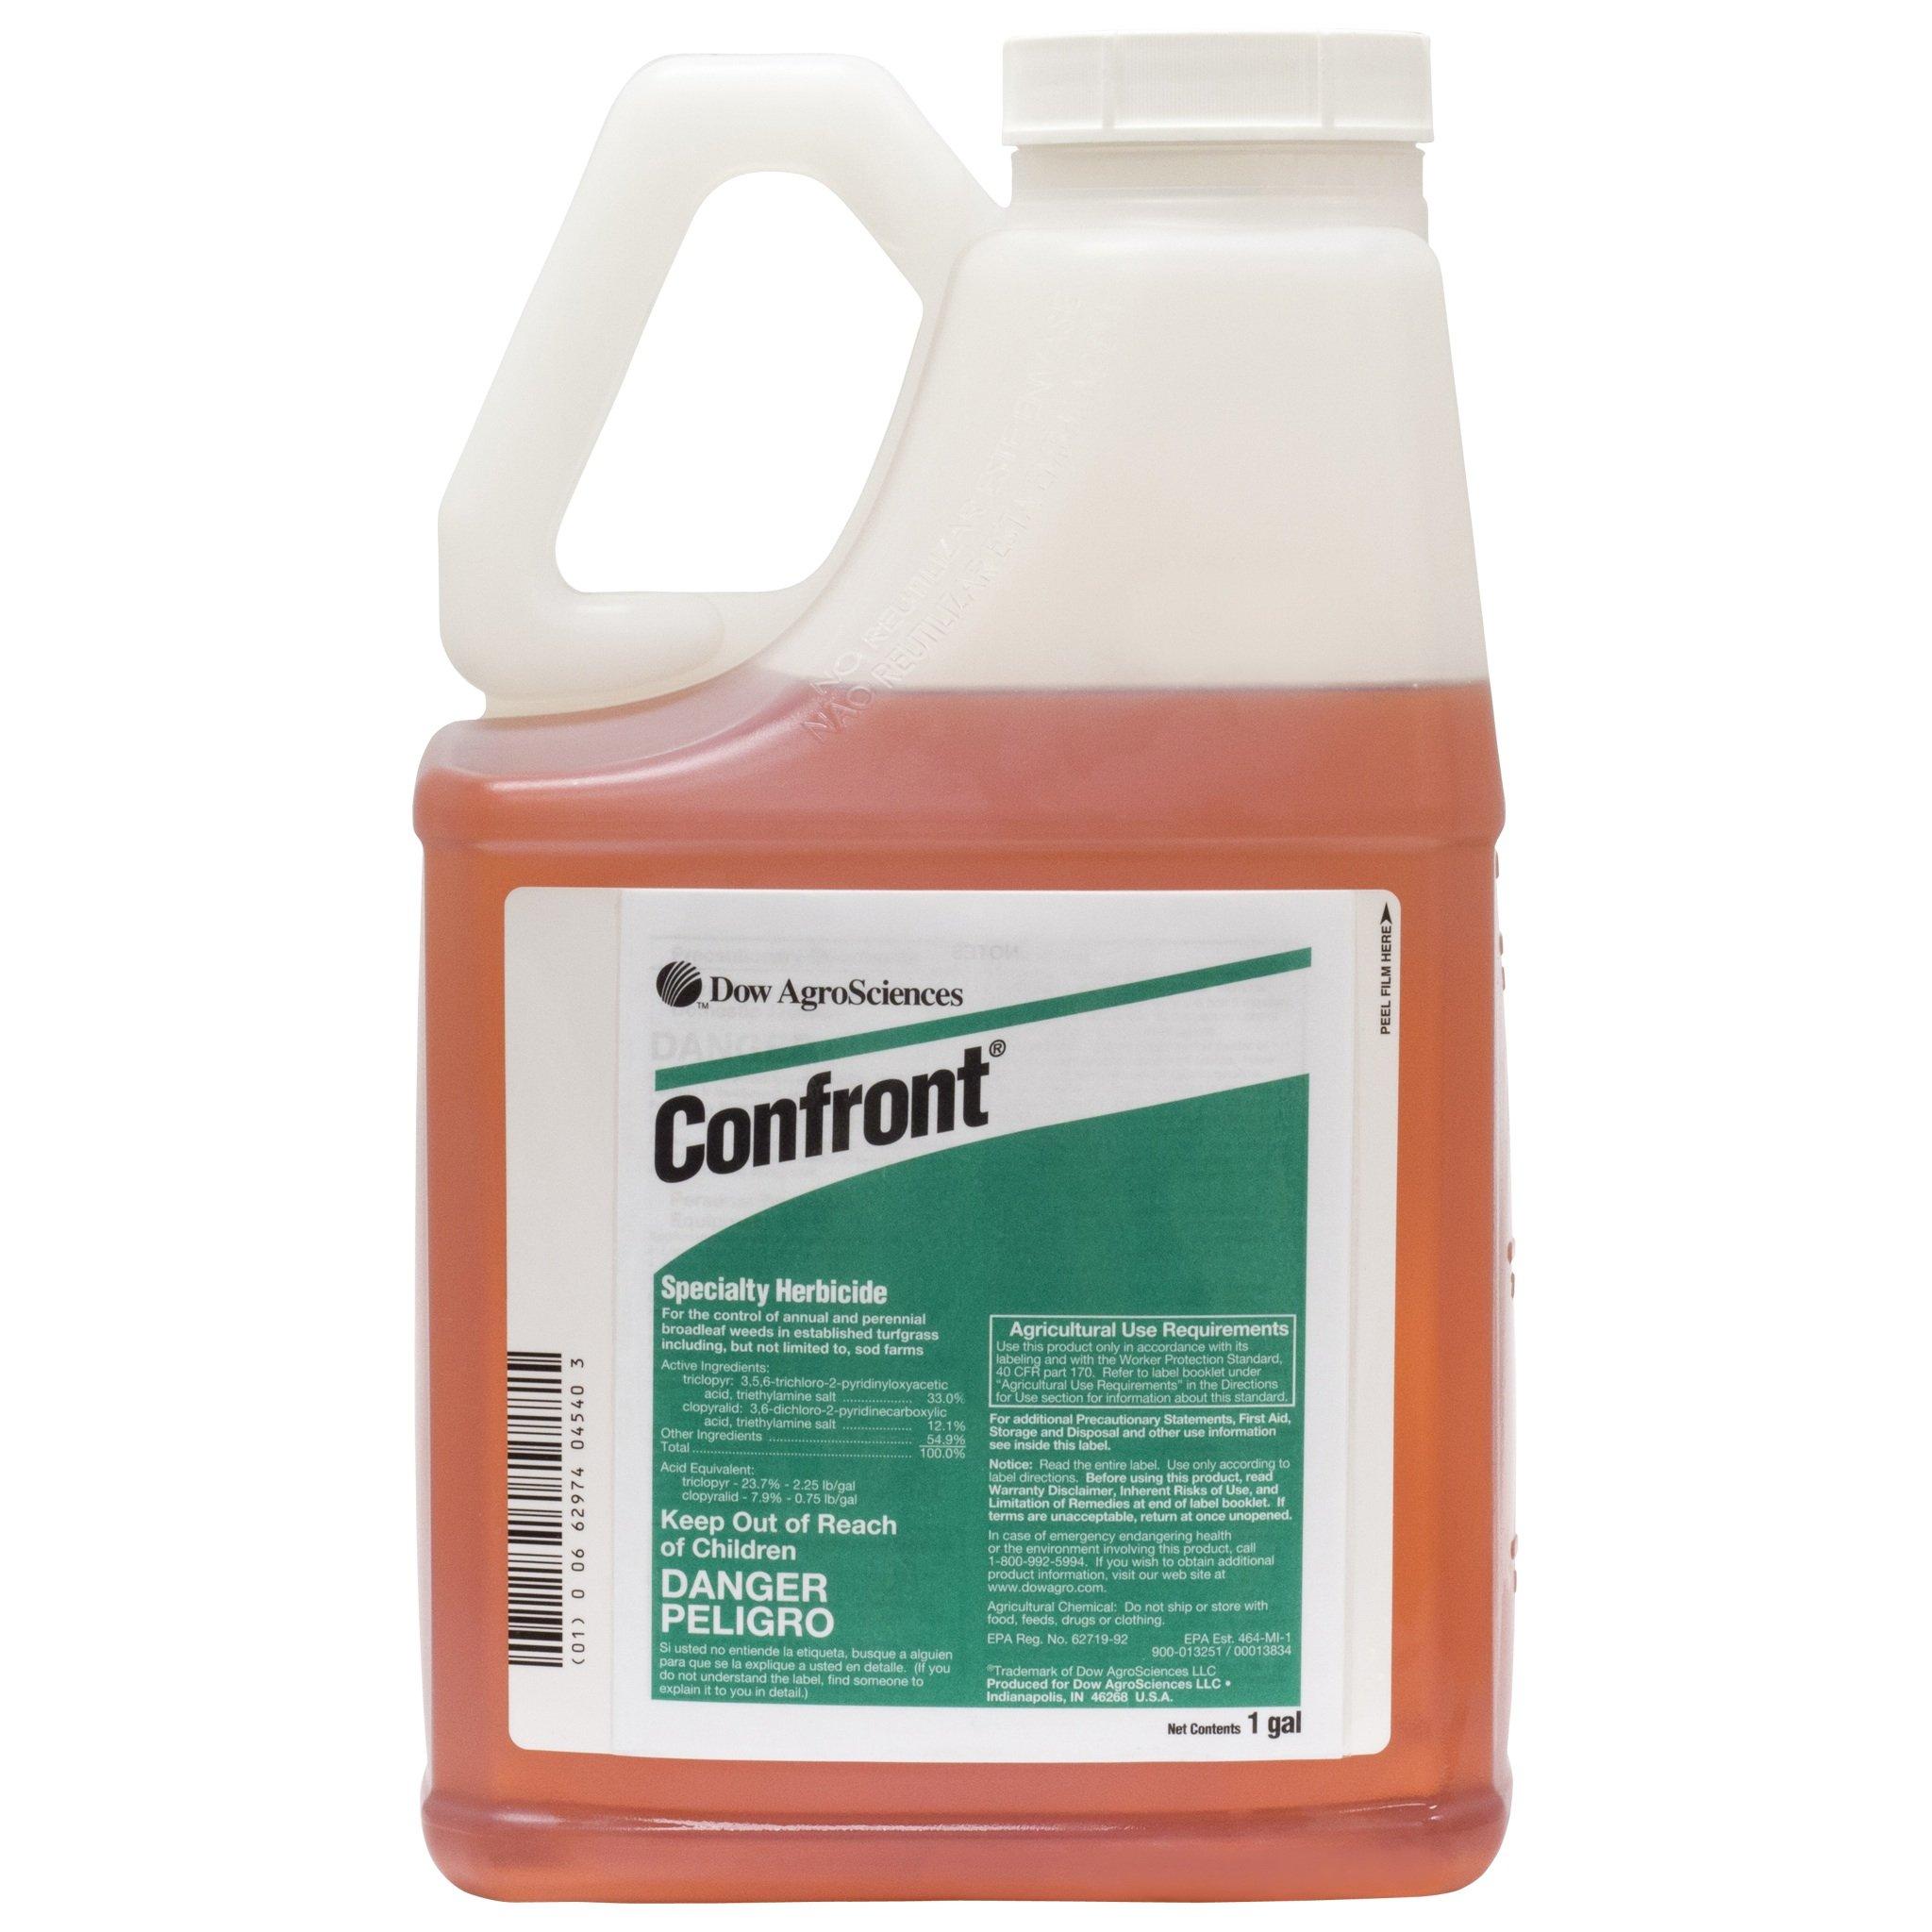 Confront - 1 Gallon - Broadleaf Control for Lawns